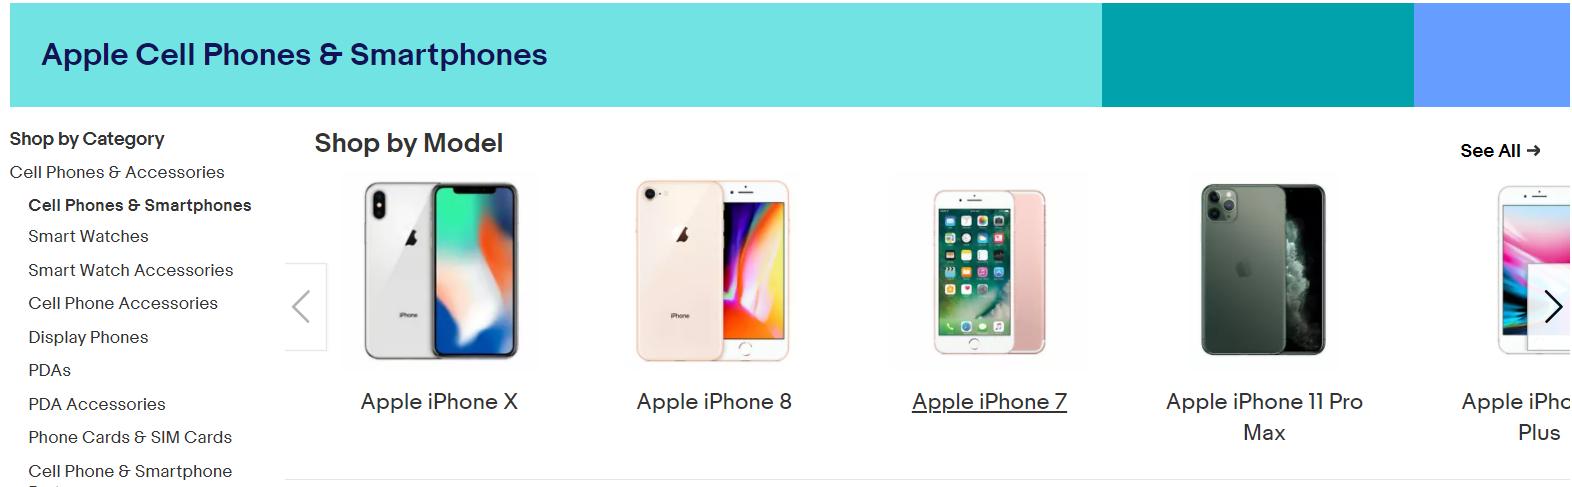 Apple smartphones on ebay